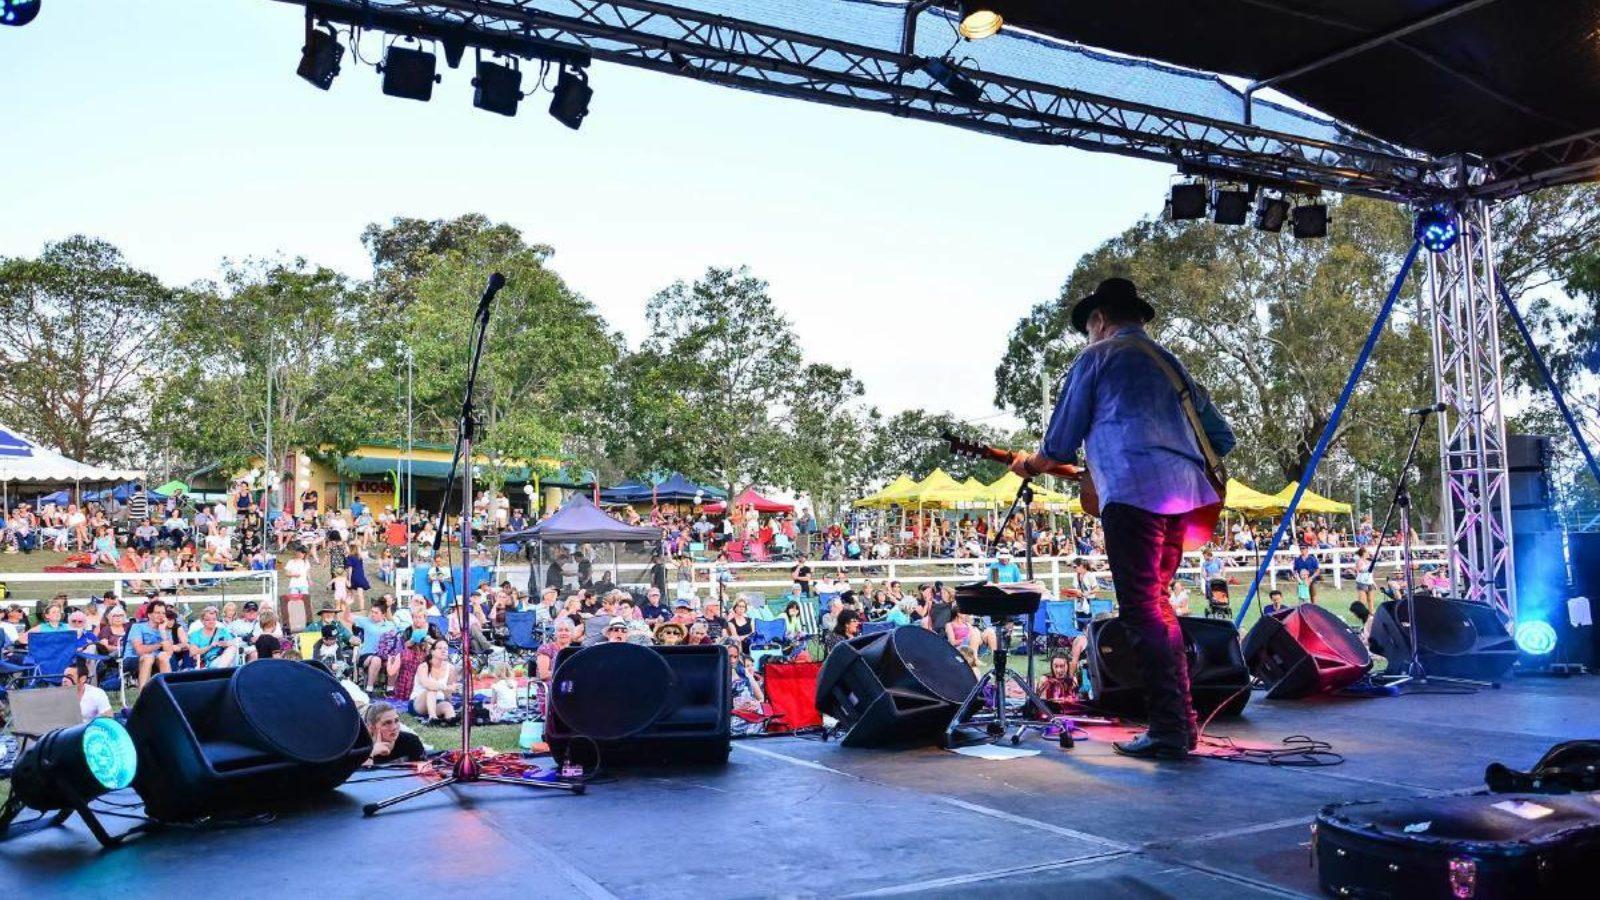 Wingham Akoostik Music Festival